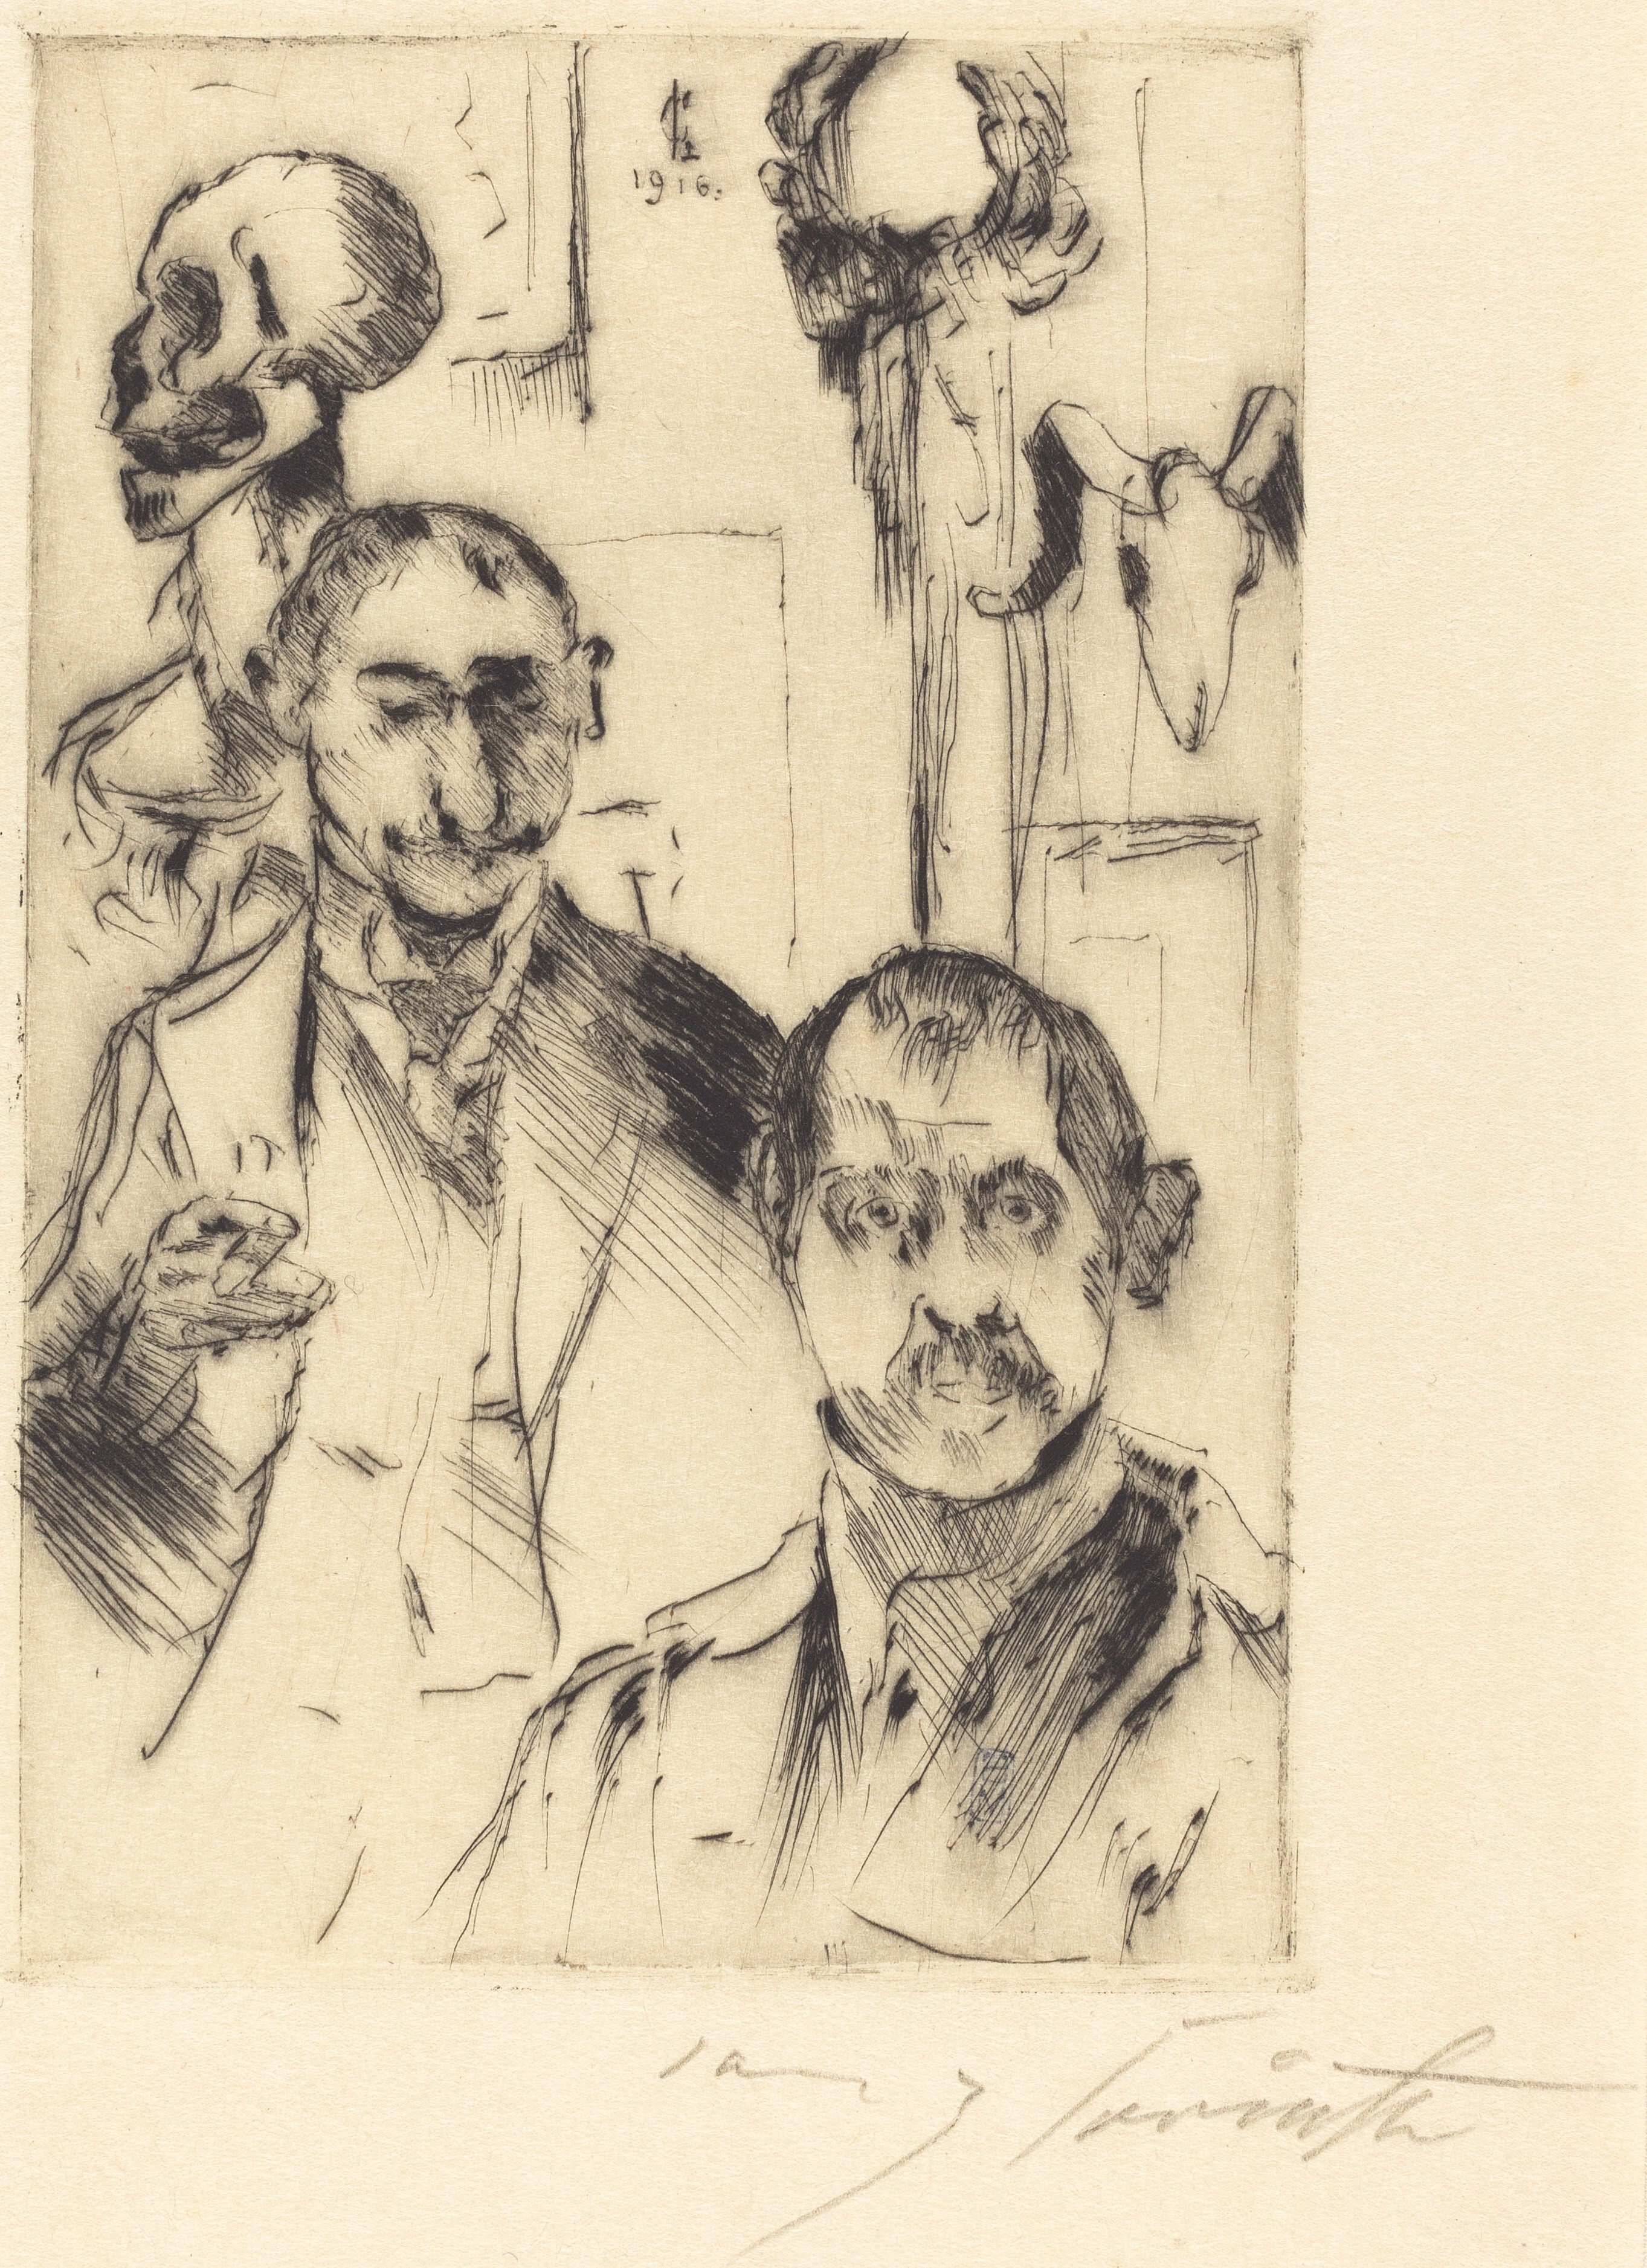 Corinth 1916 doppelbildnis_mit_skelett_(double_portrait_with_skeleton)